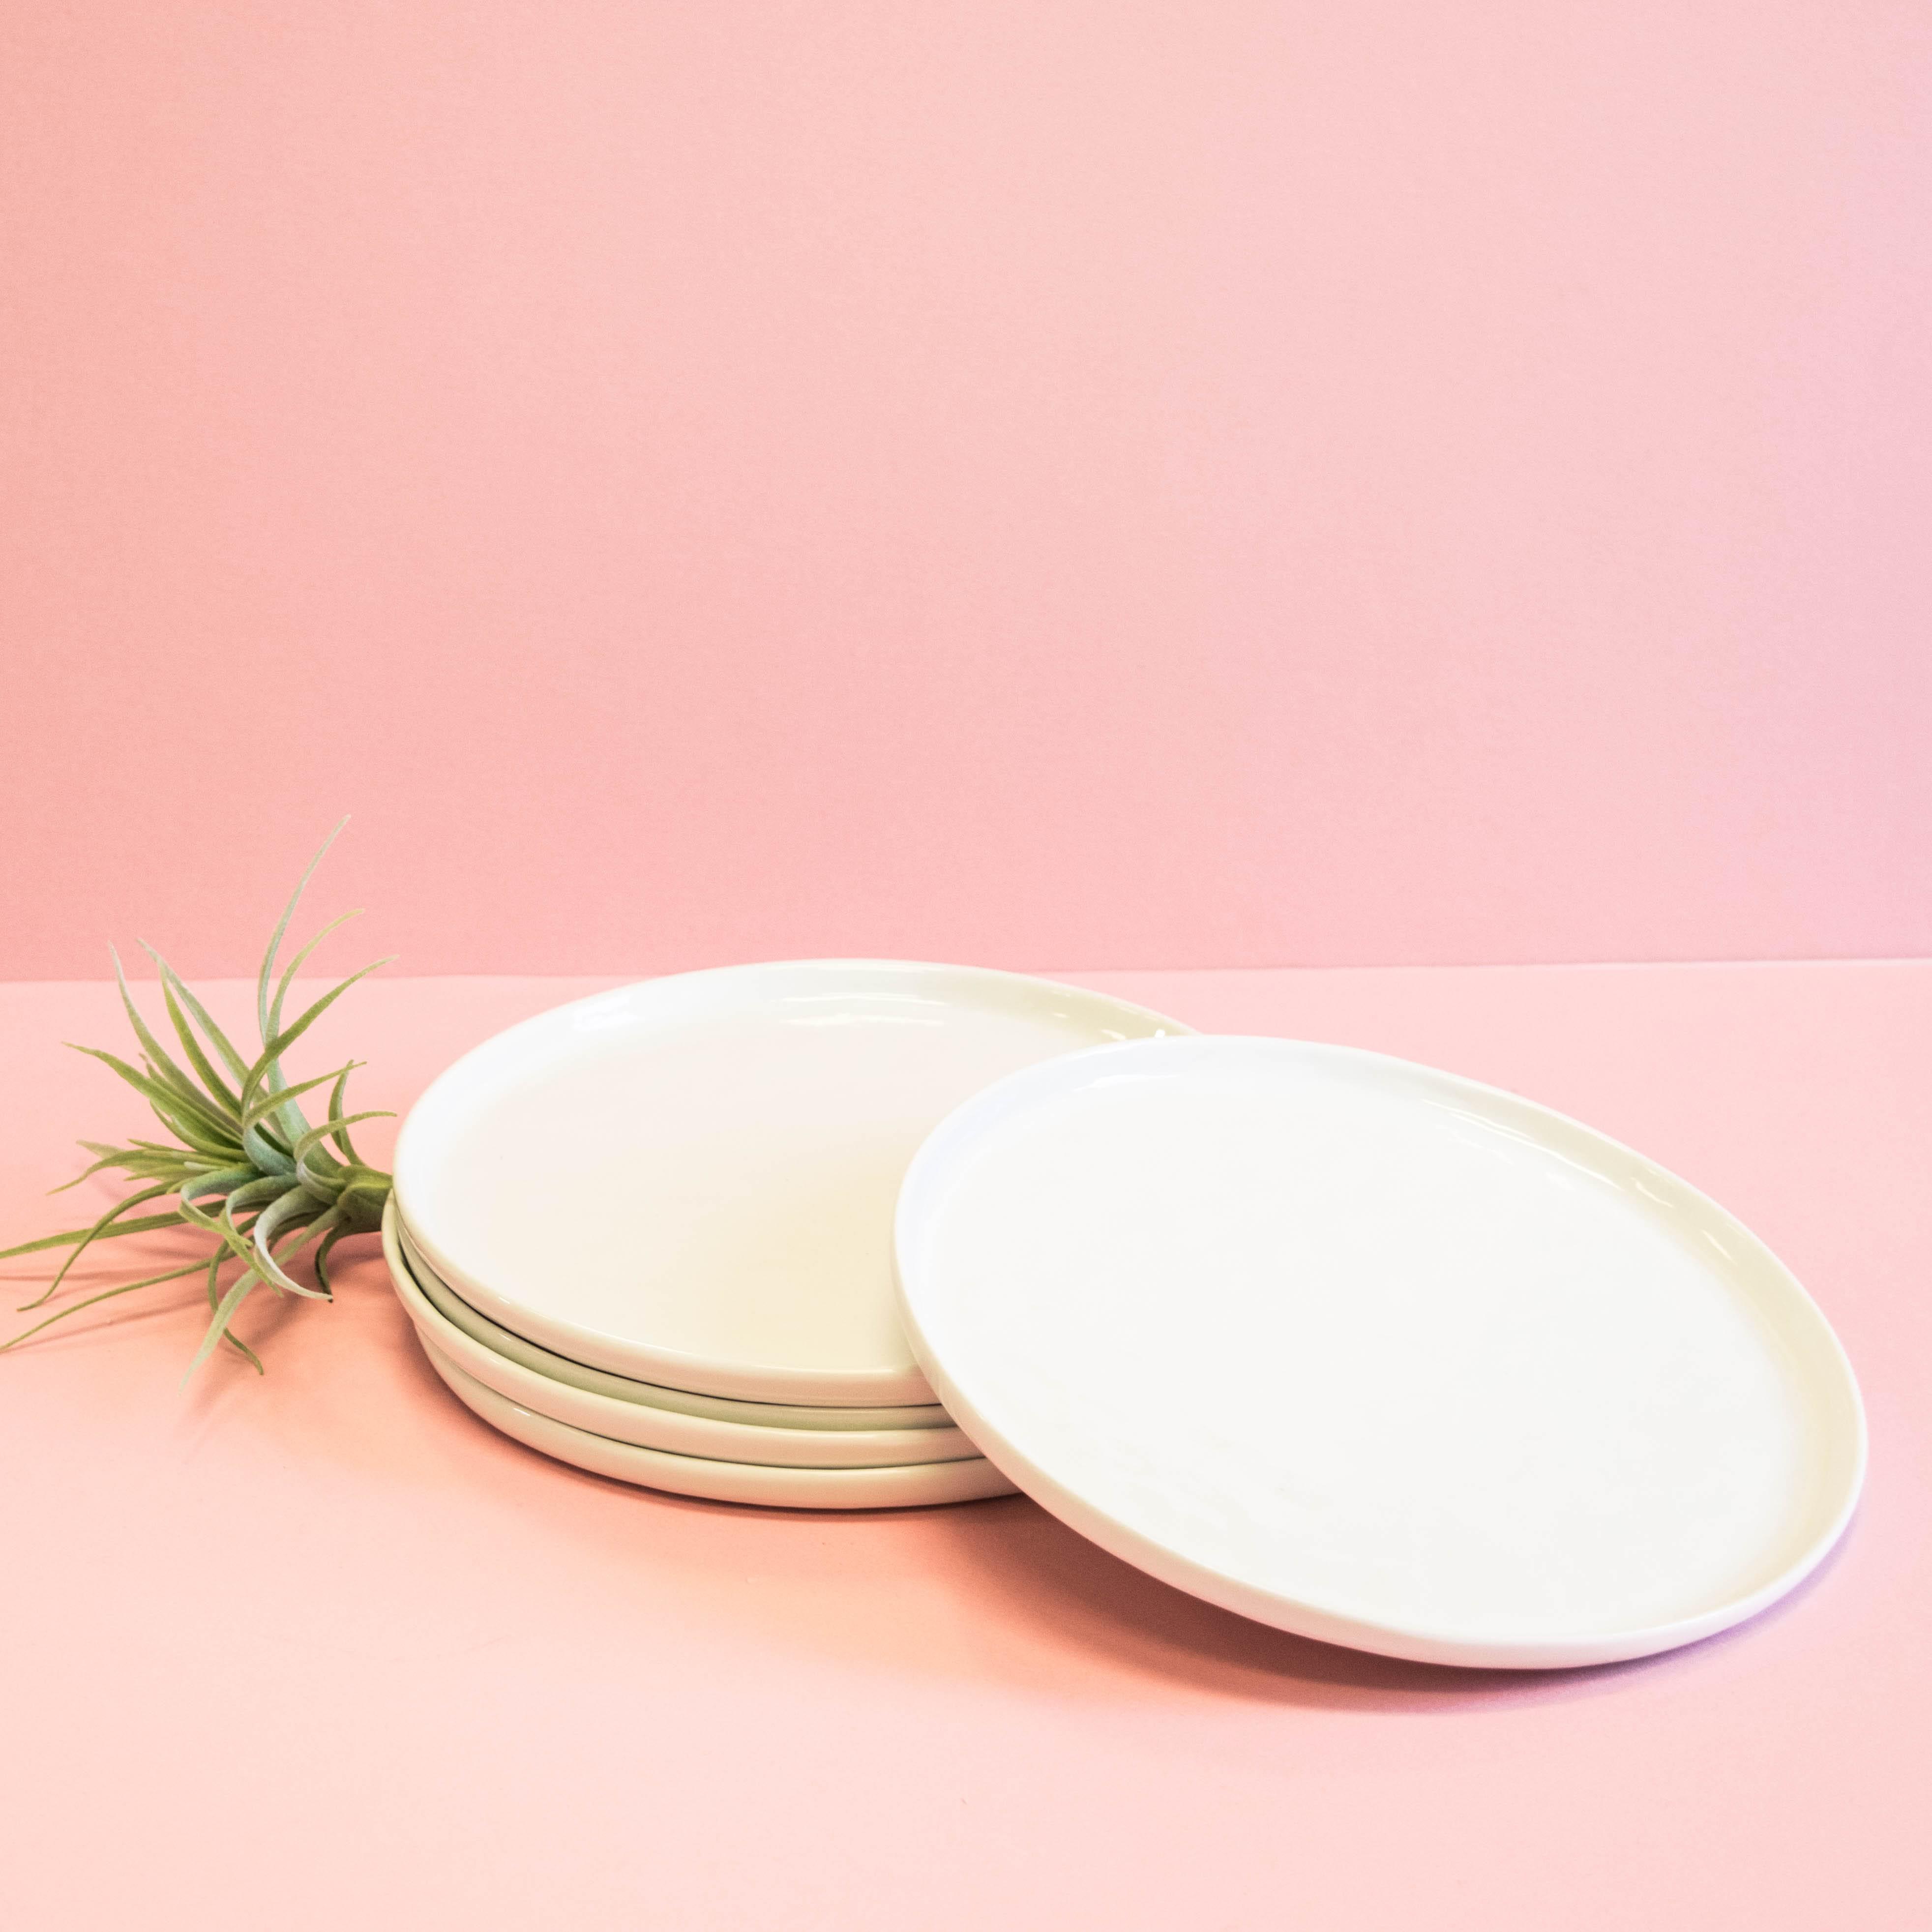 Organic Salad Plates